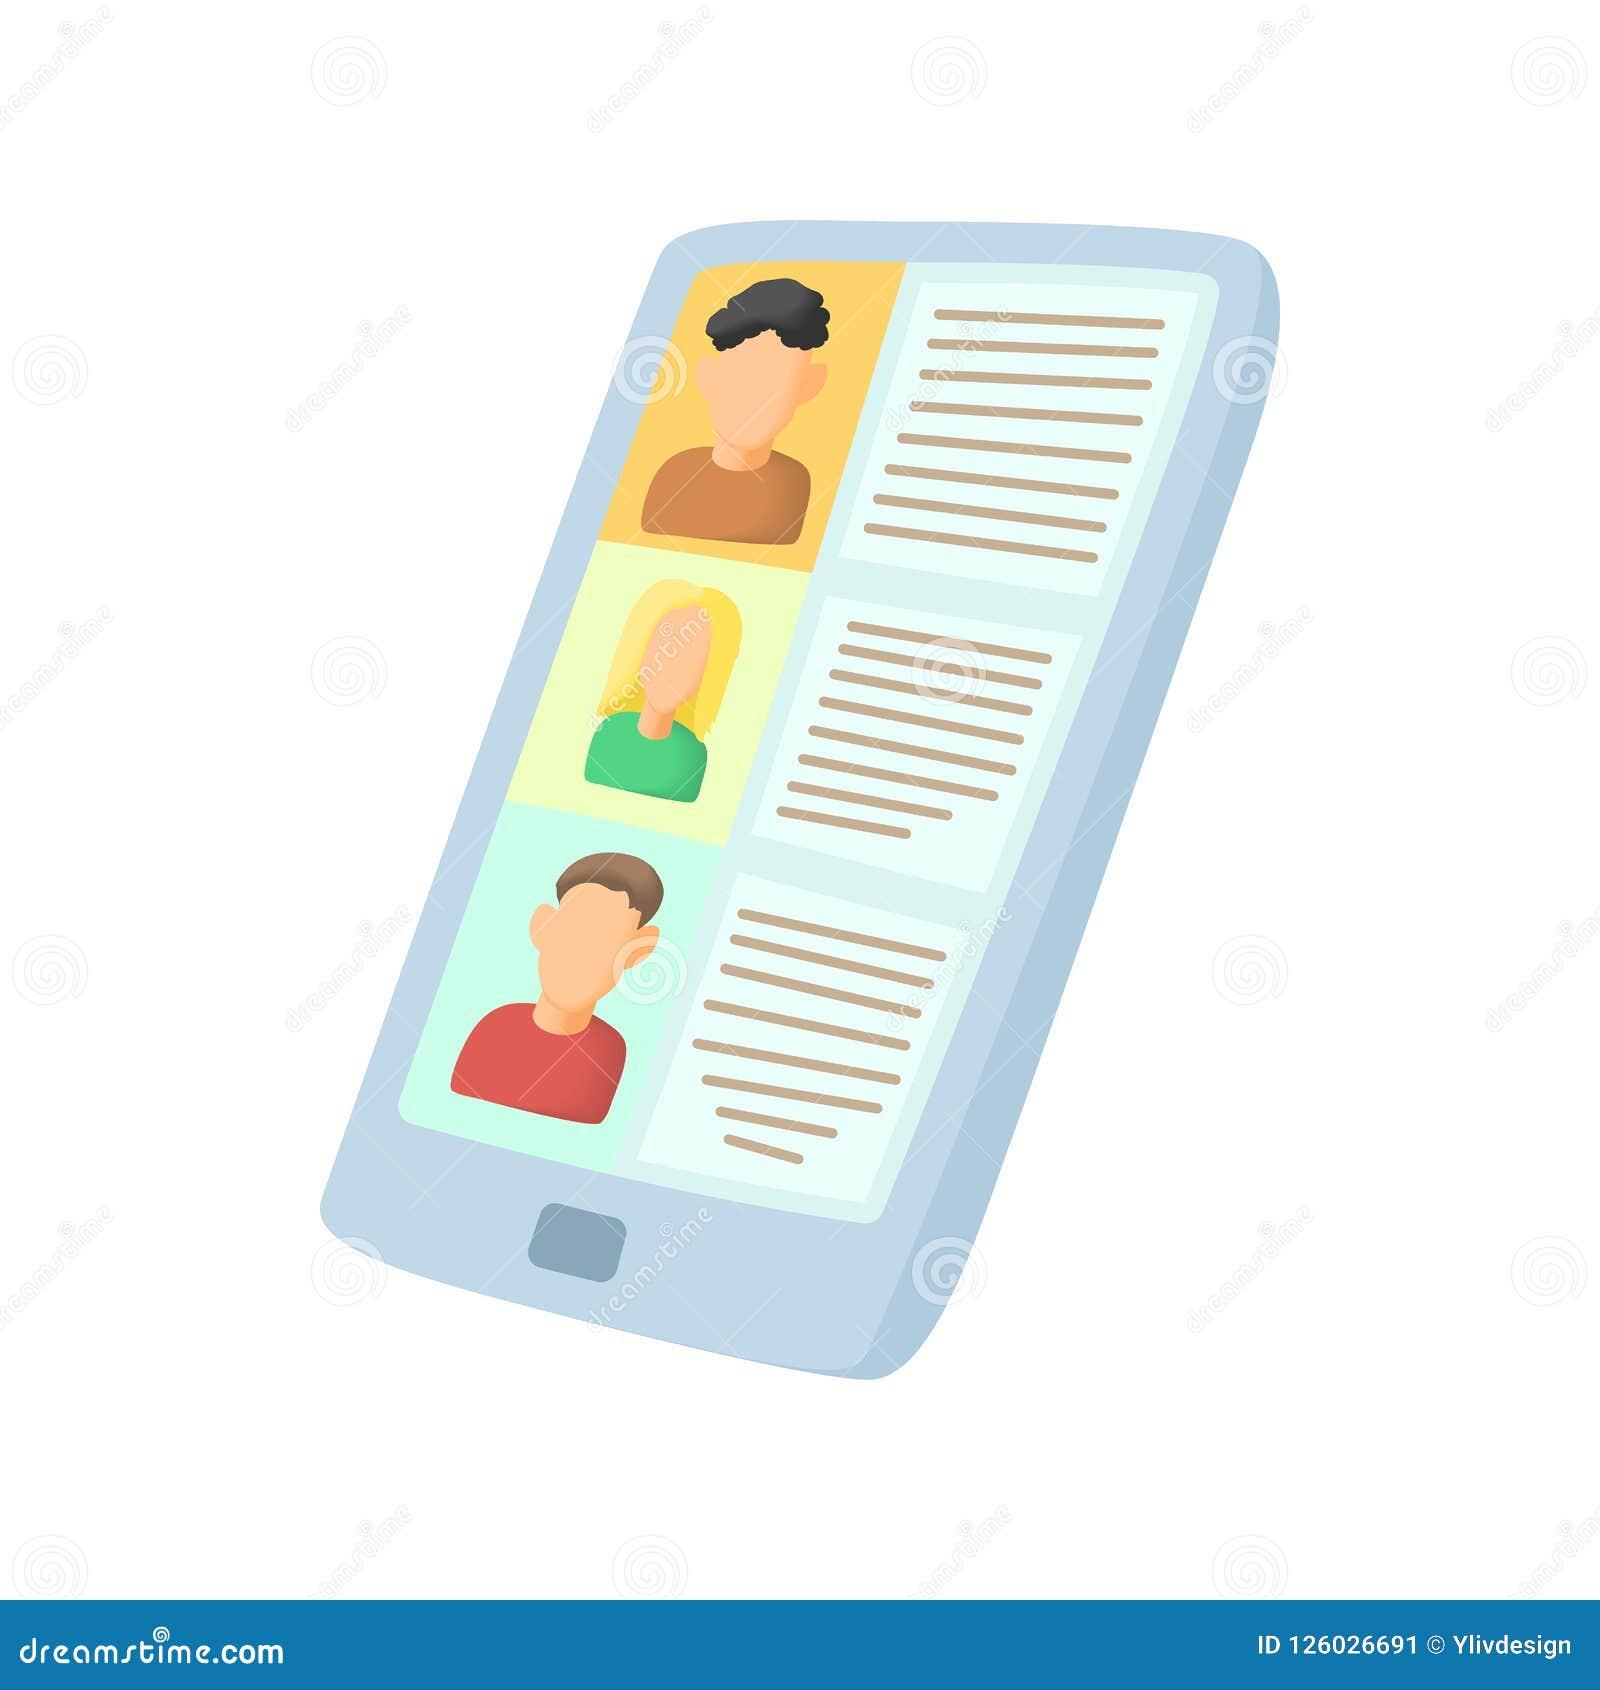 See Resume On Tablet Icon Cartoon Style Stock Illustration